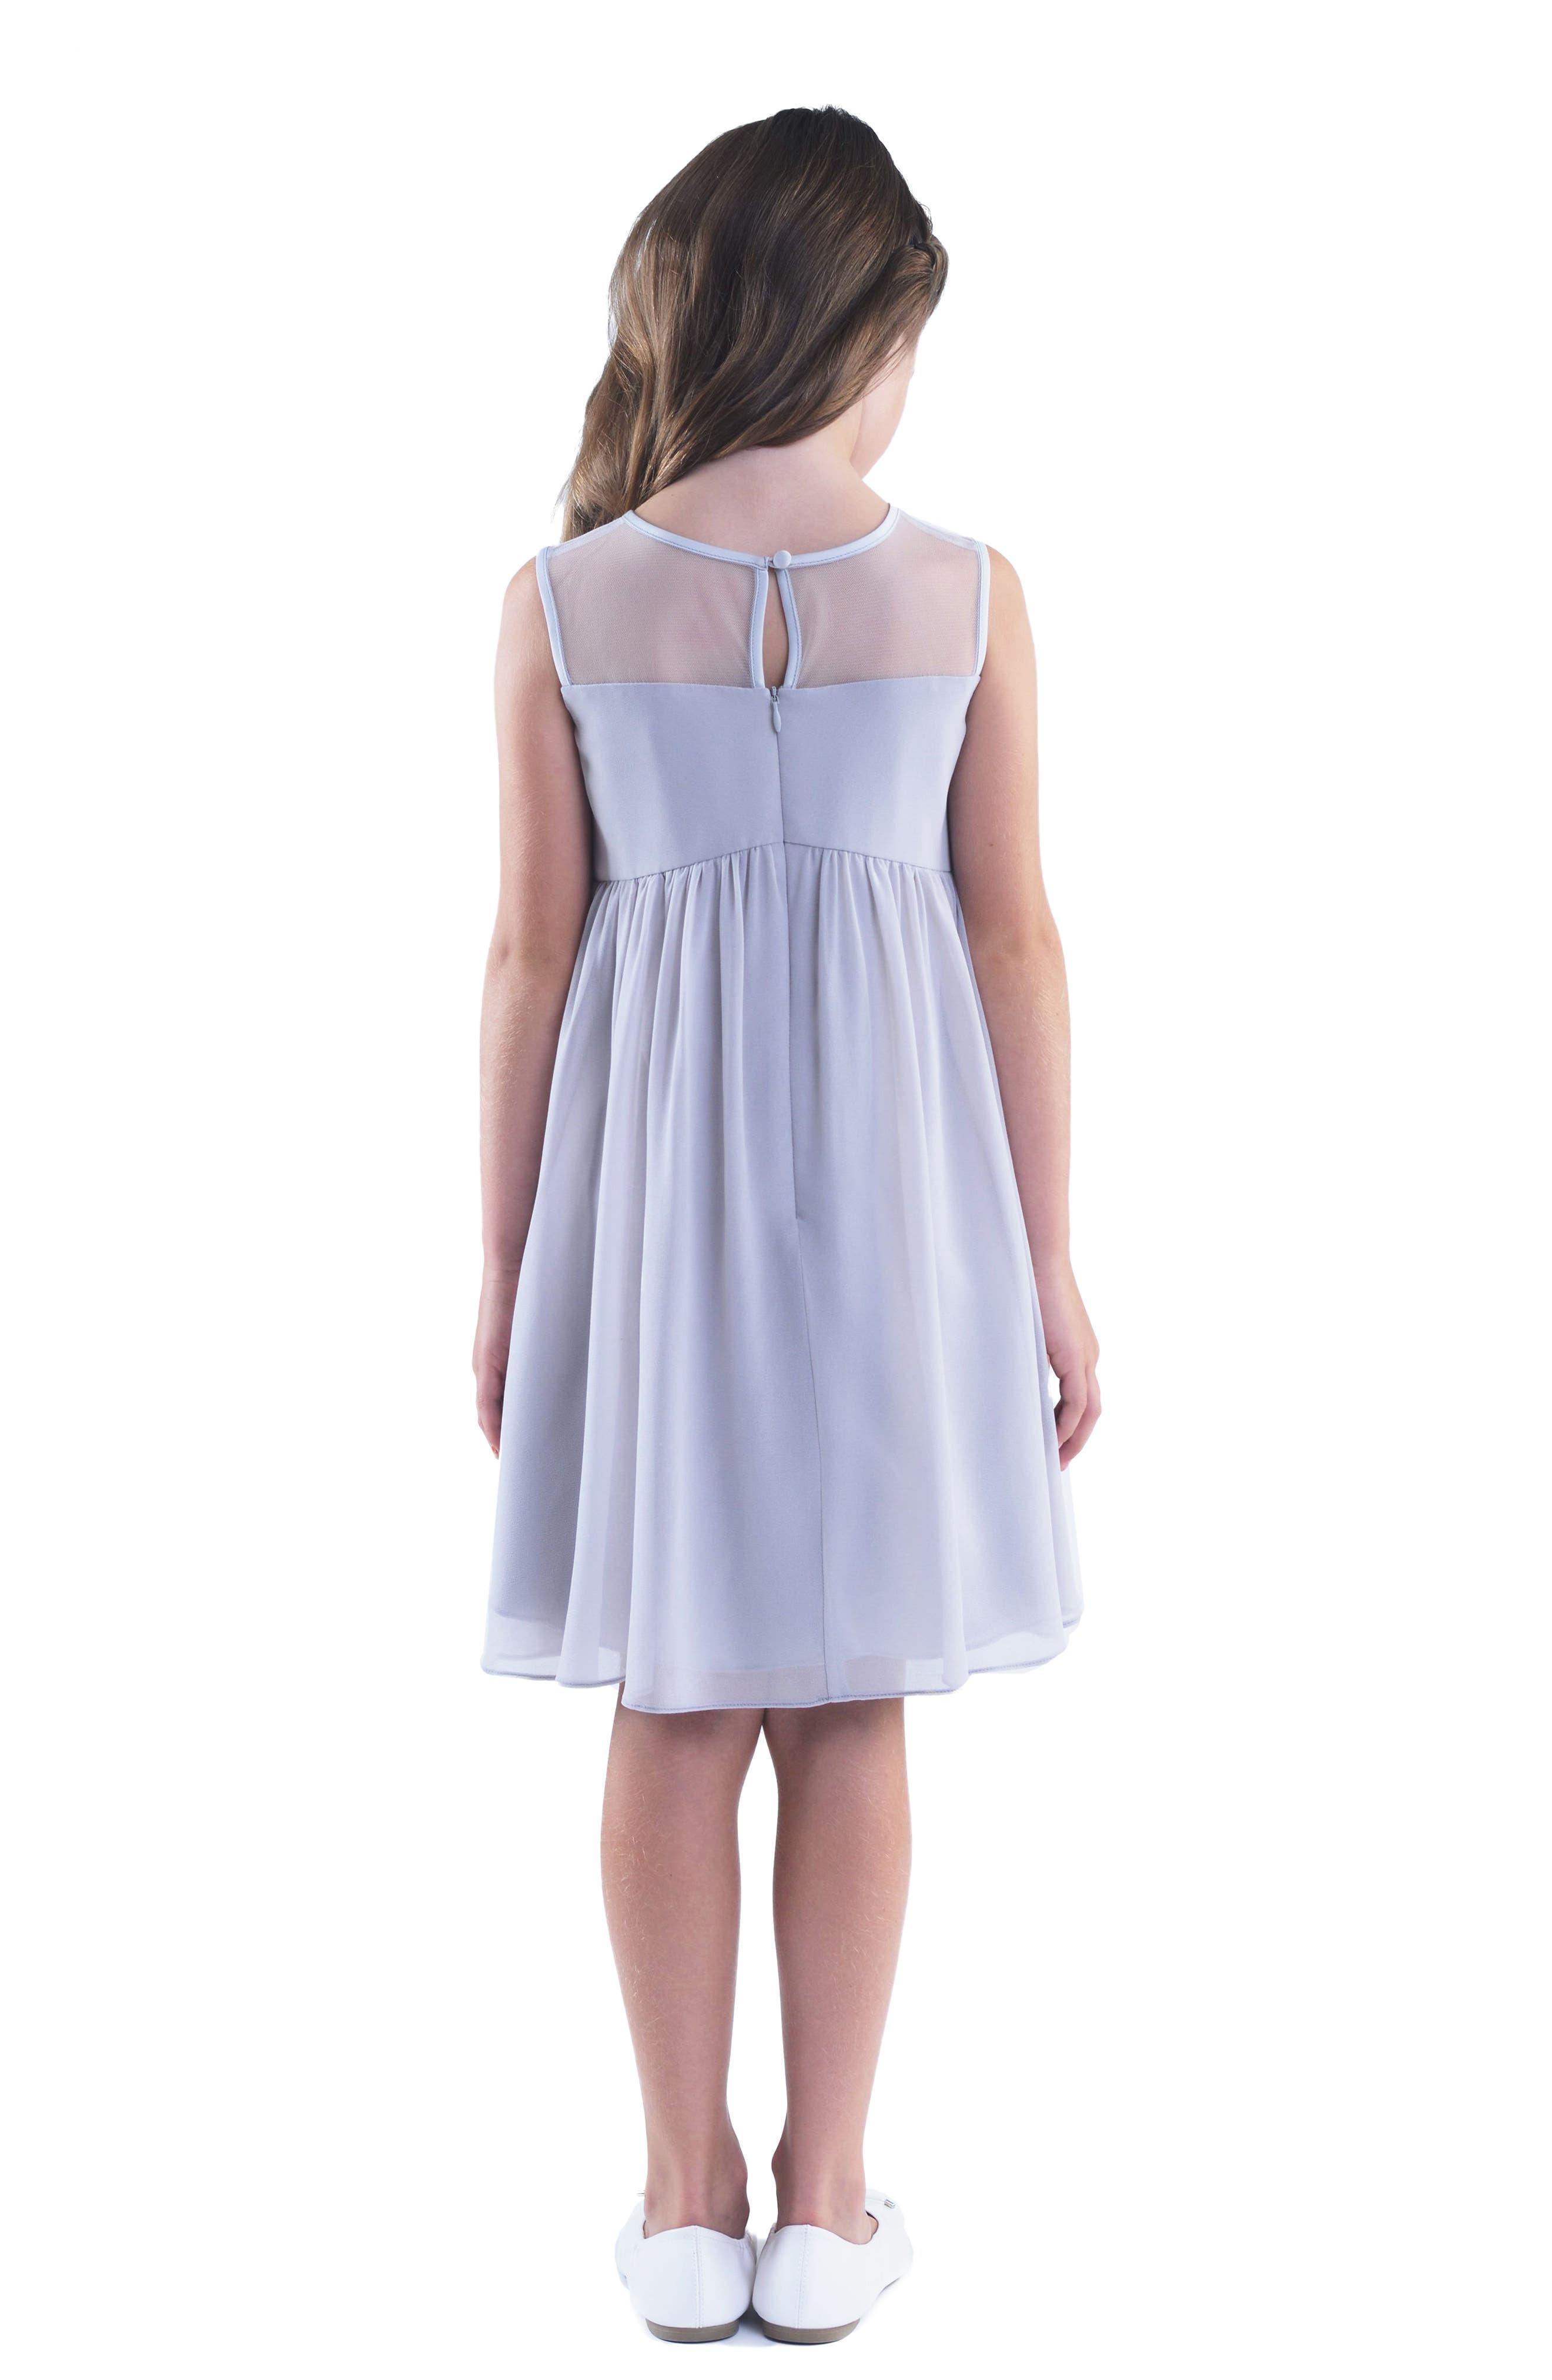 Illusion Neckline Dress,                             Alternate thumbnail 2, color,                             040